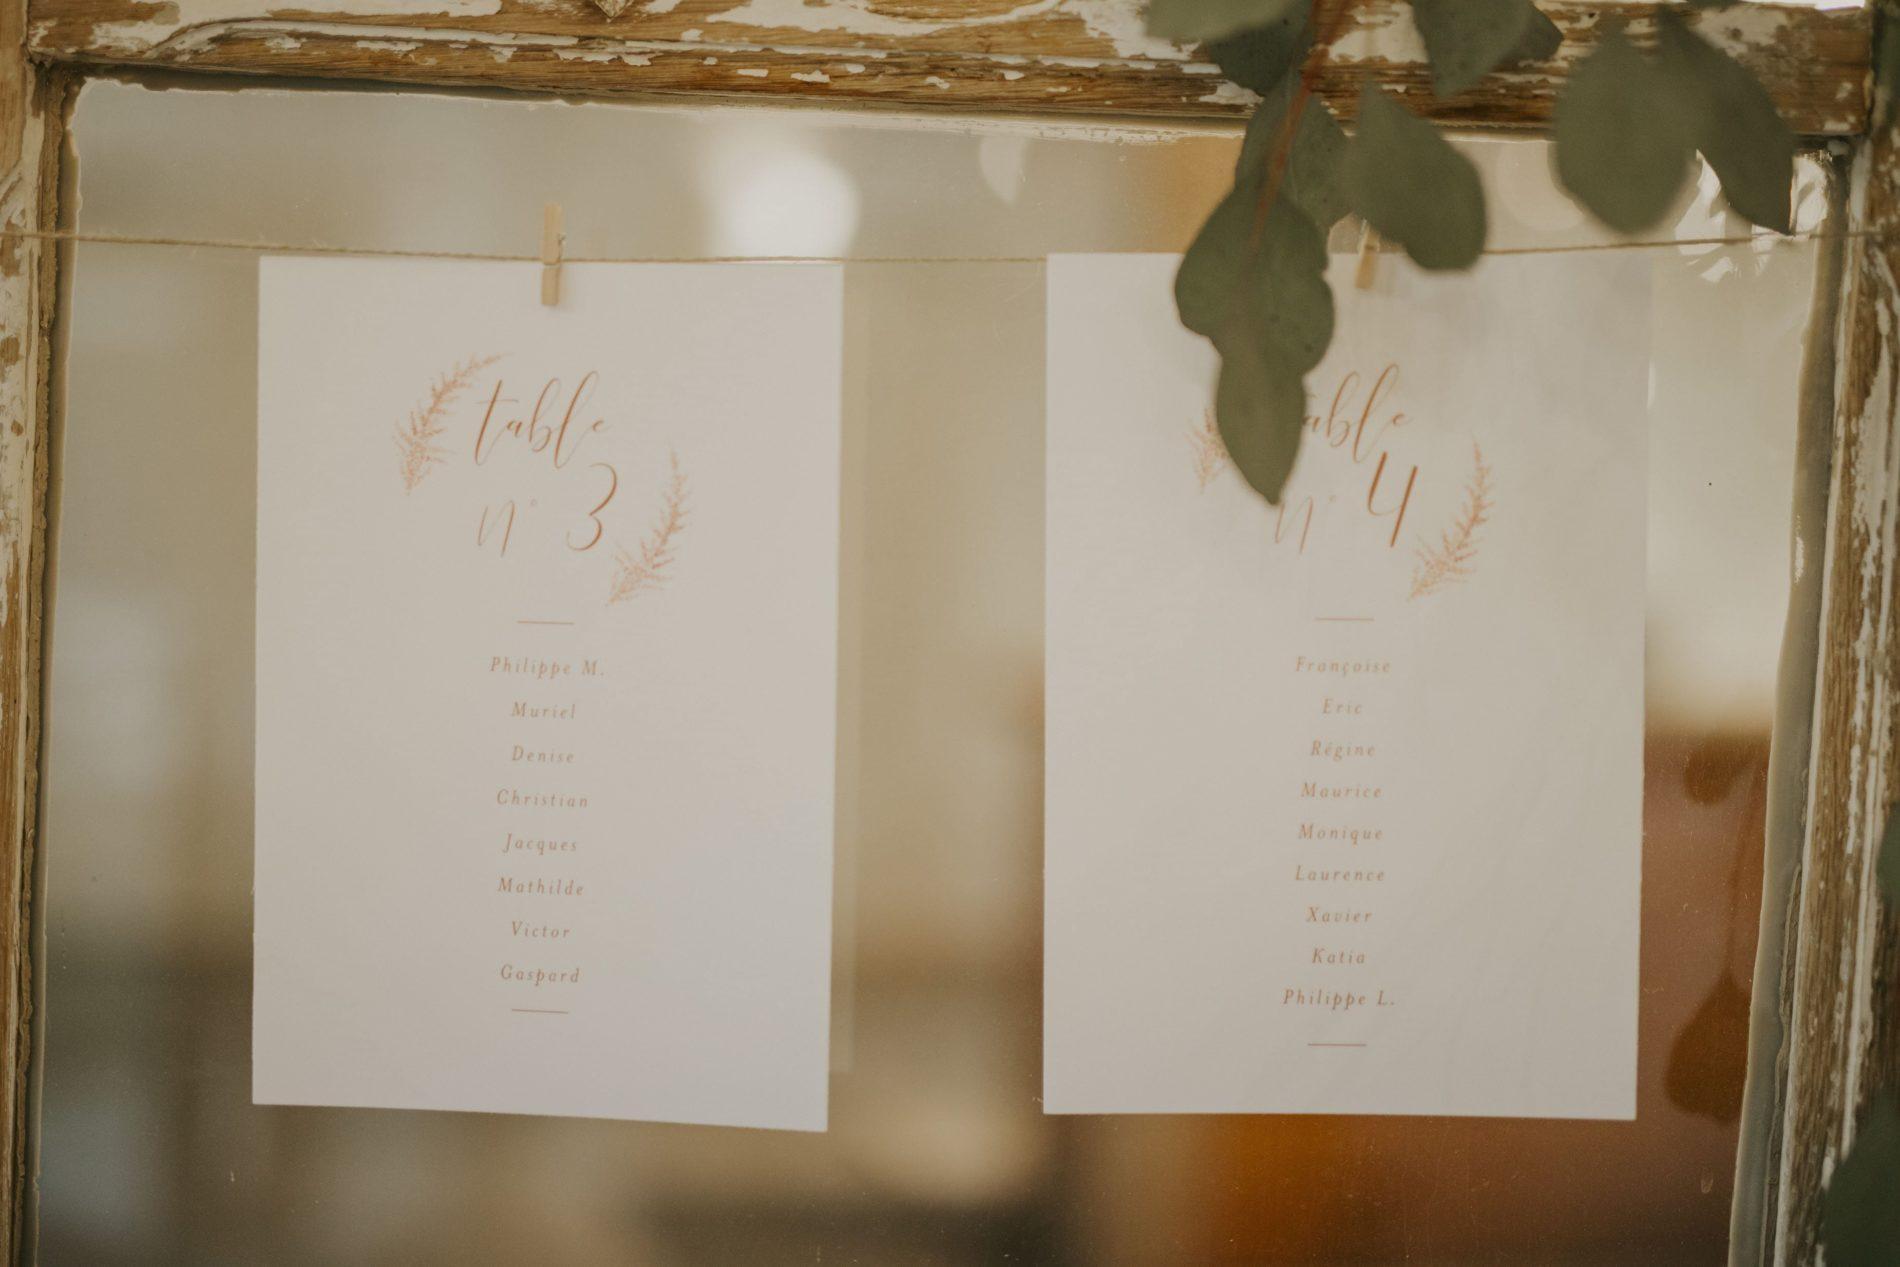 0155_04-CelineSereivuth-157-obonheurdesdames-decoration-mariage-location-Jordane-Chaillou